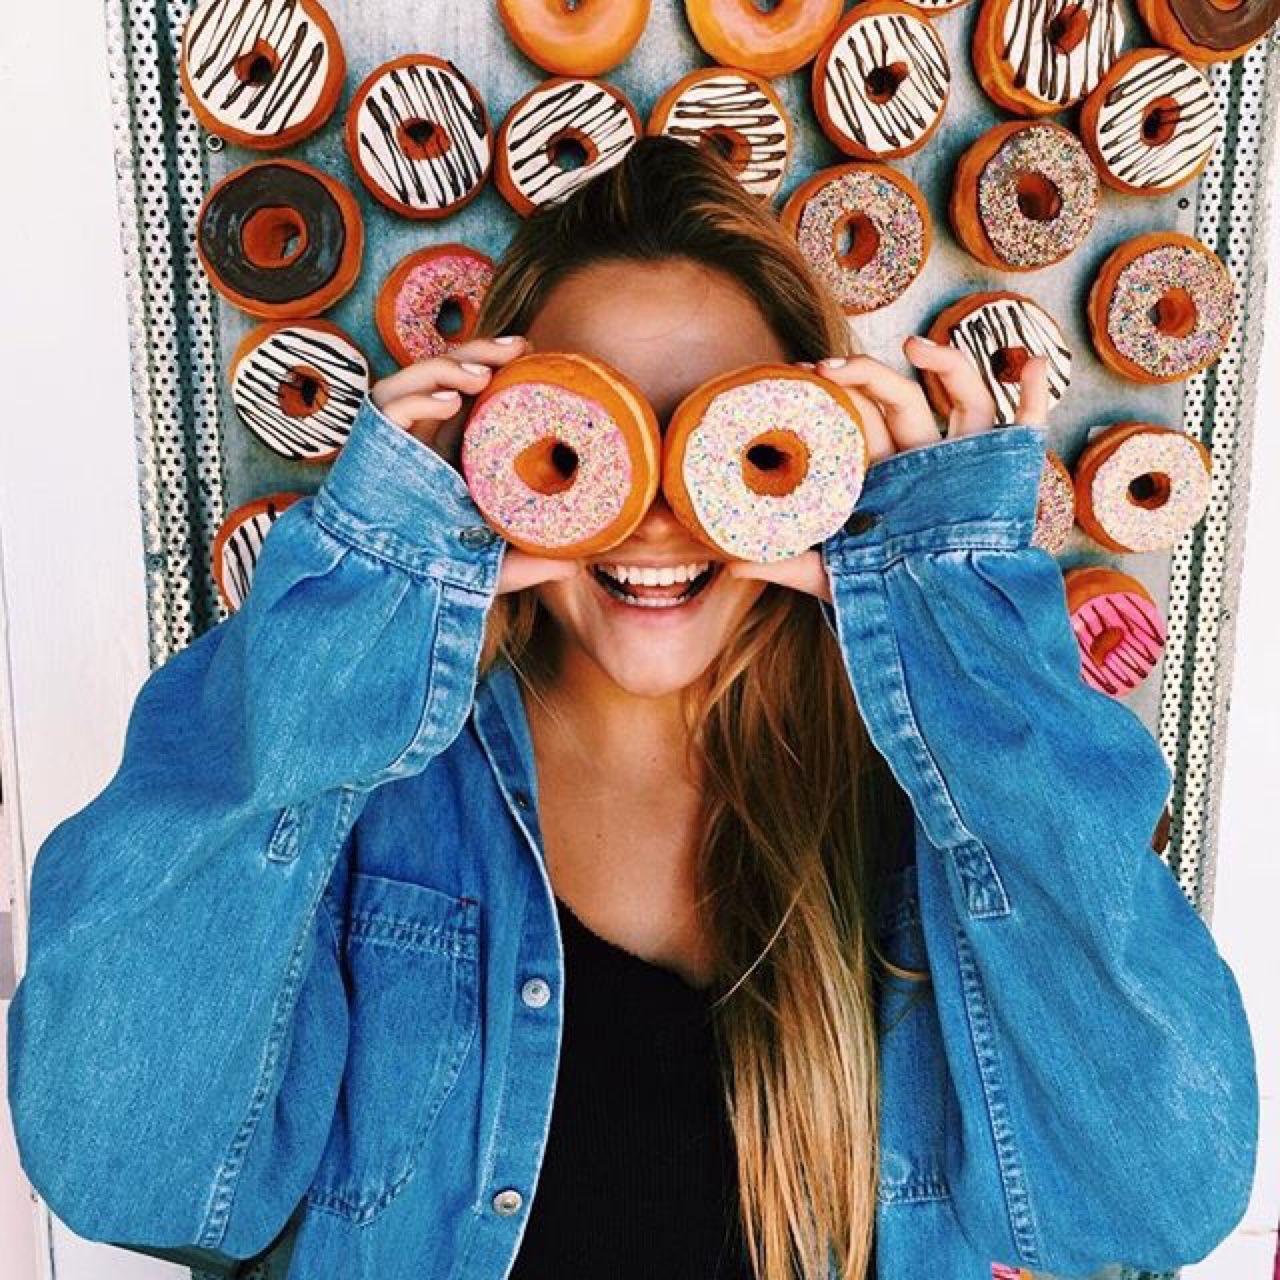 Best 25 The Muppets Ideas On Pinterest: Best 25+ Profile Pictures Instagram Ideas On Pinterest